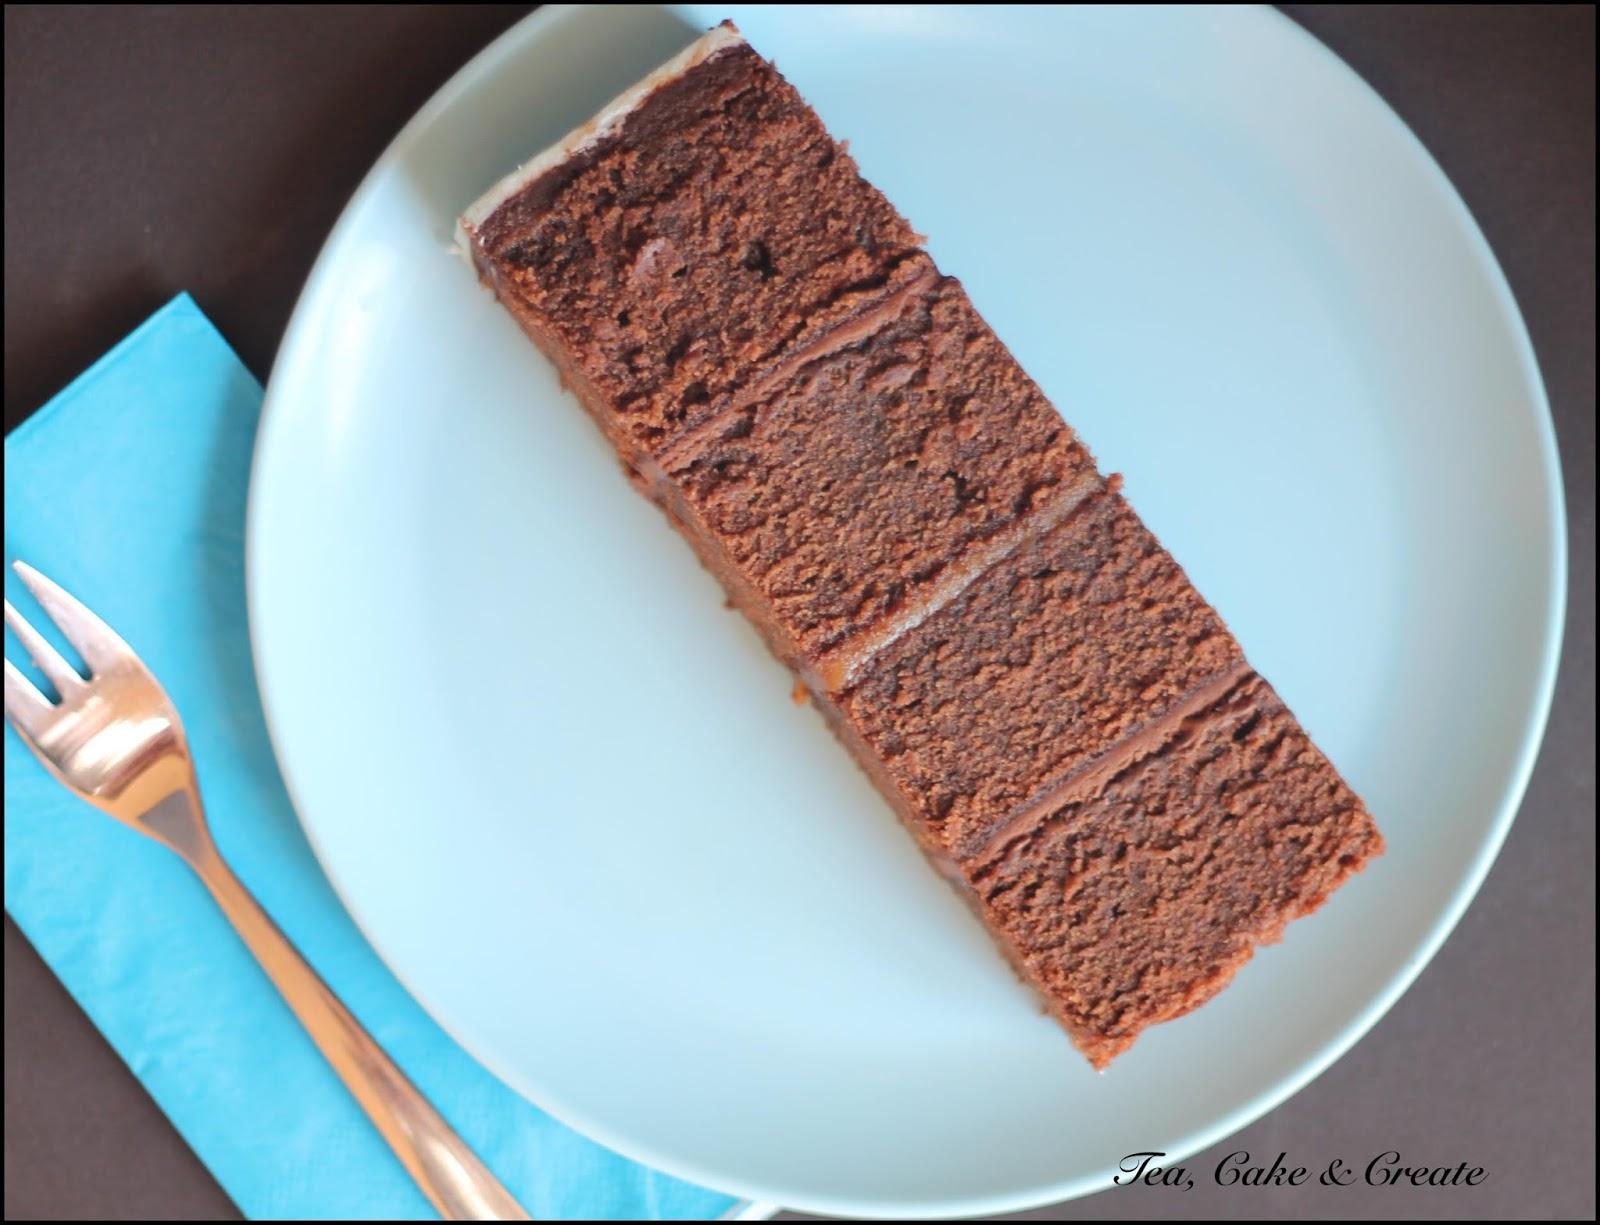 Dense Chocolate Cake Recipe For Stacking